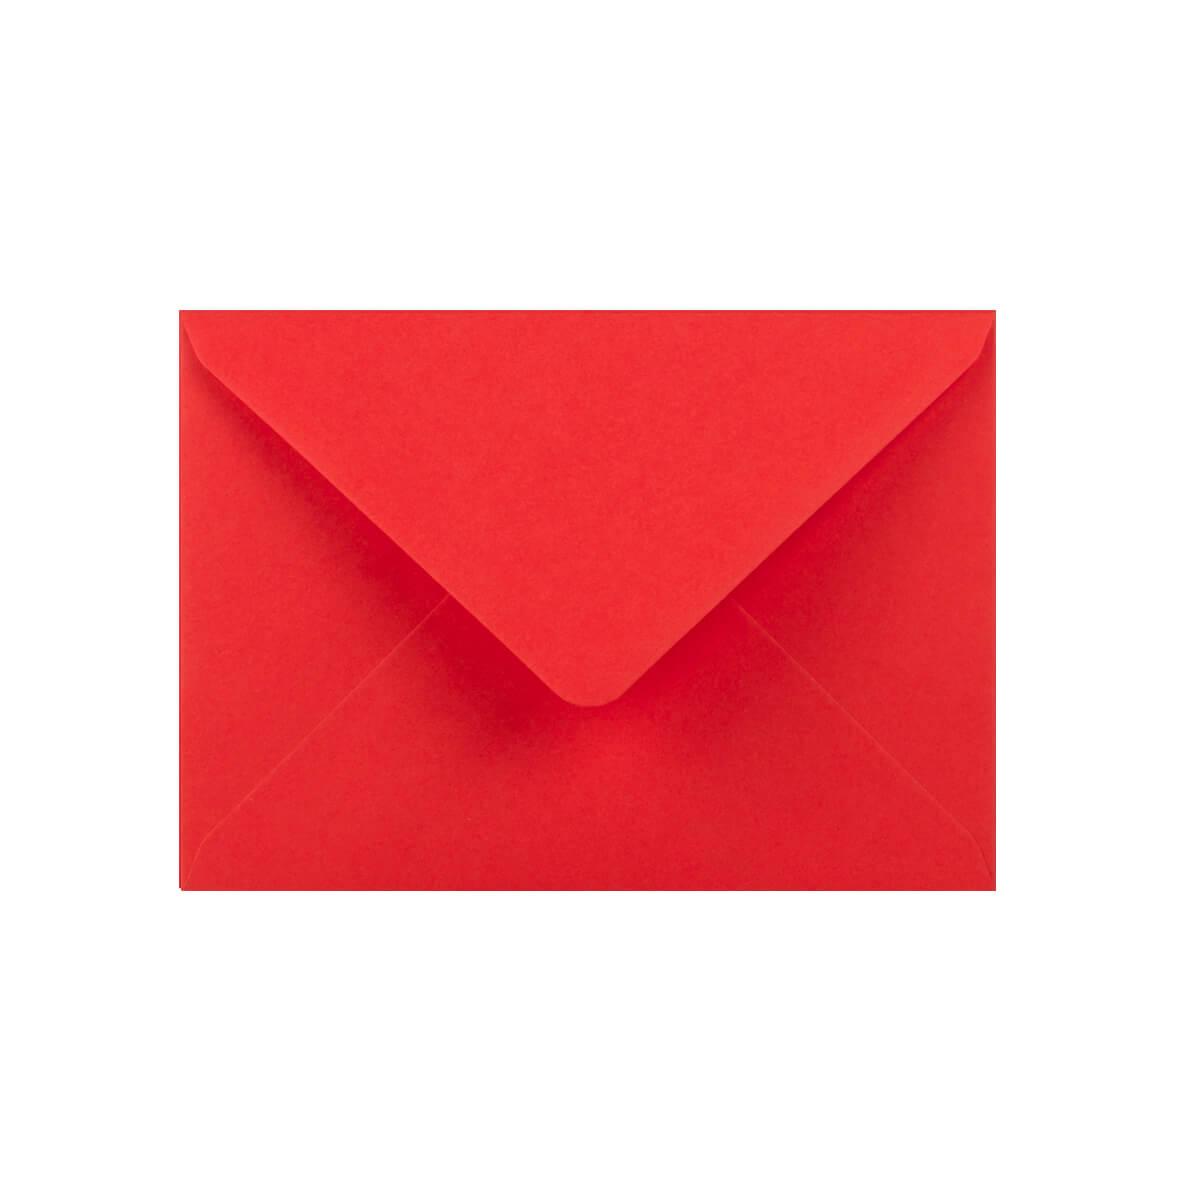 BRIGHT RED 125 x 175mm ENVELOPES